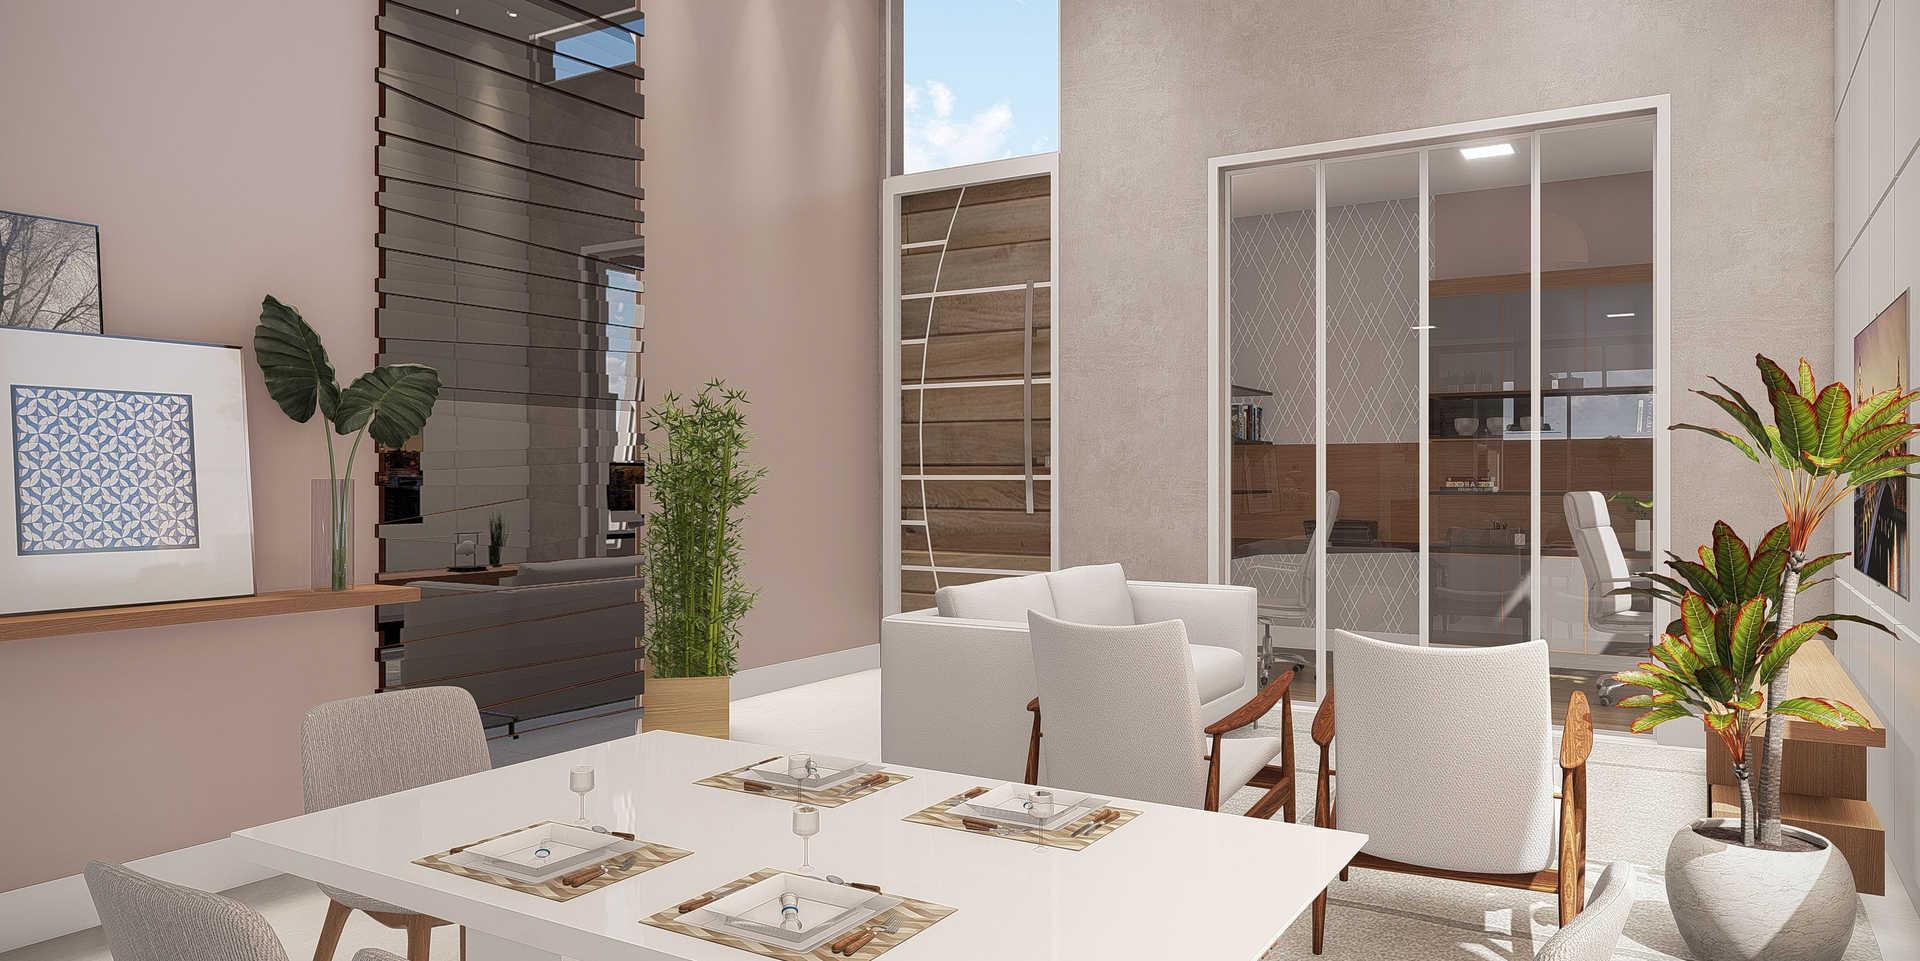 Salas e Cozinha - Jantar C2.jpg